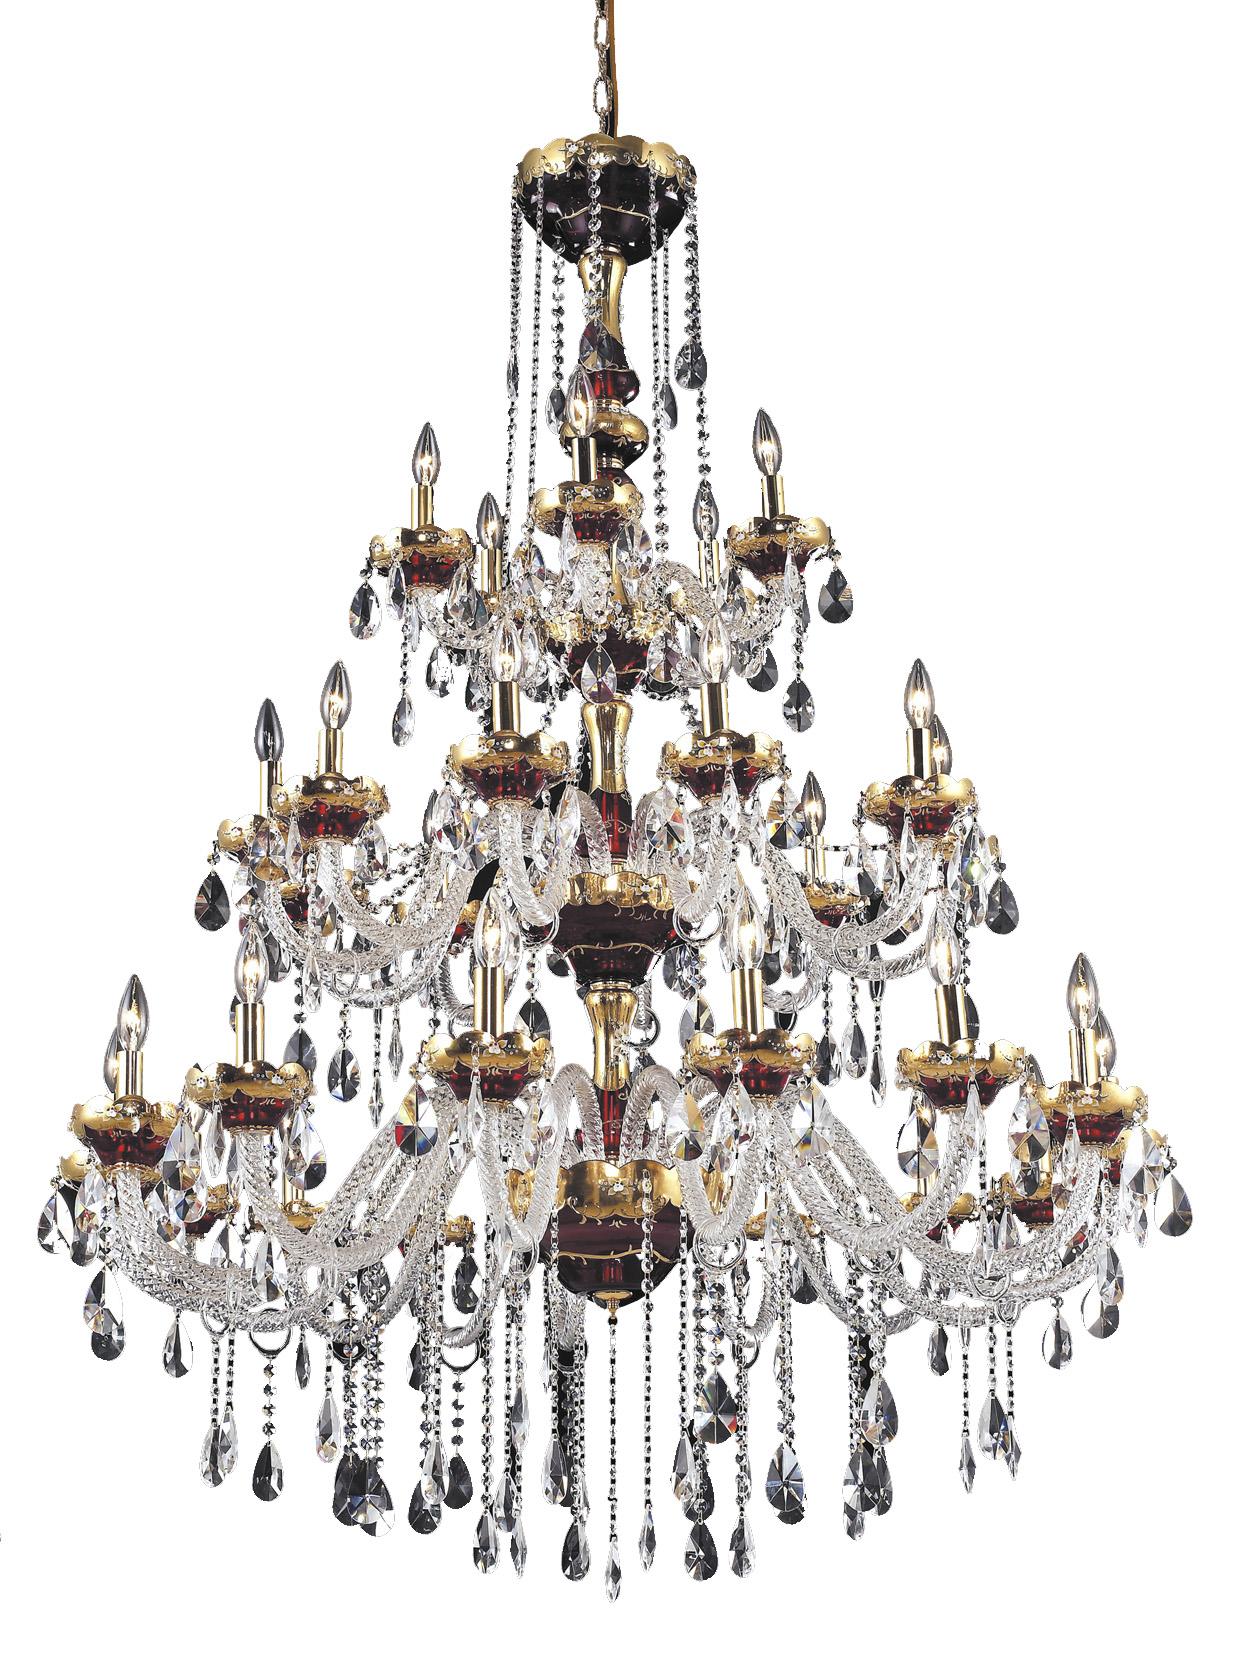 Lighting Furniture Chandelier Light Cut Crystal Photo